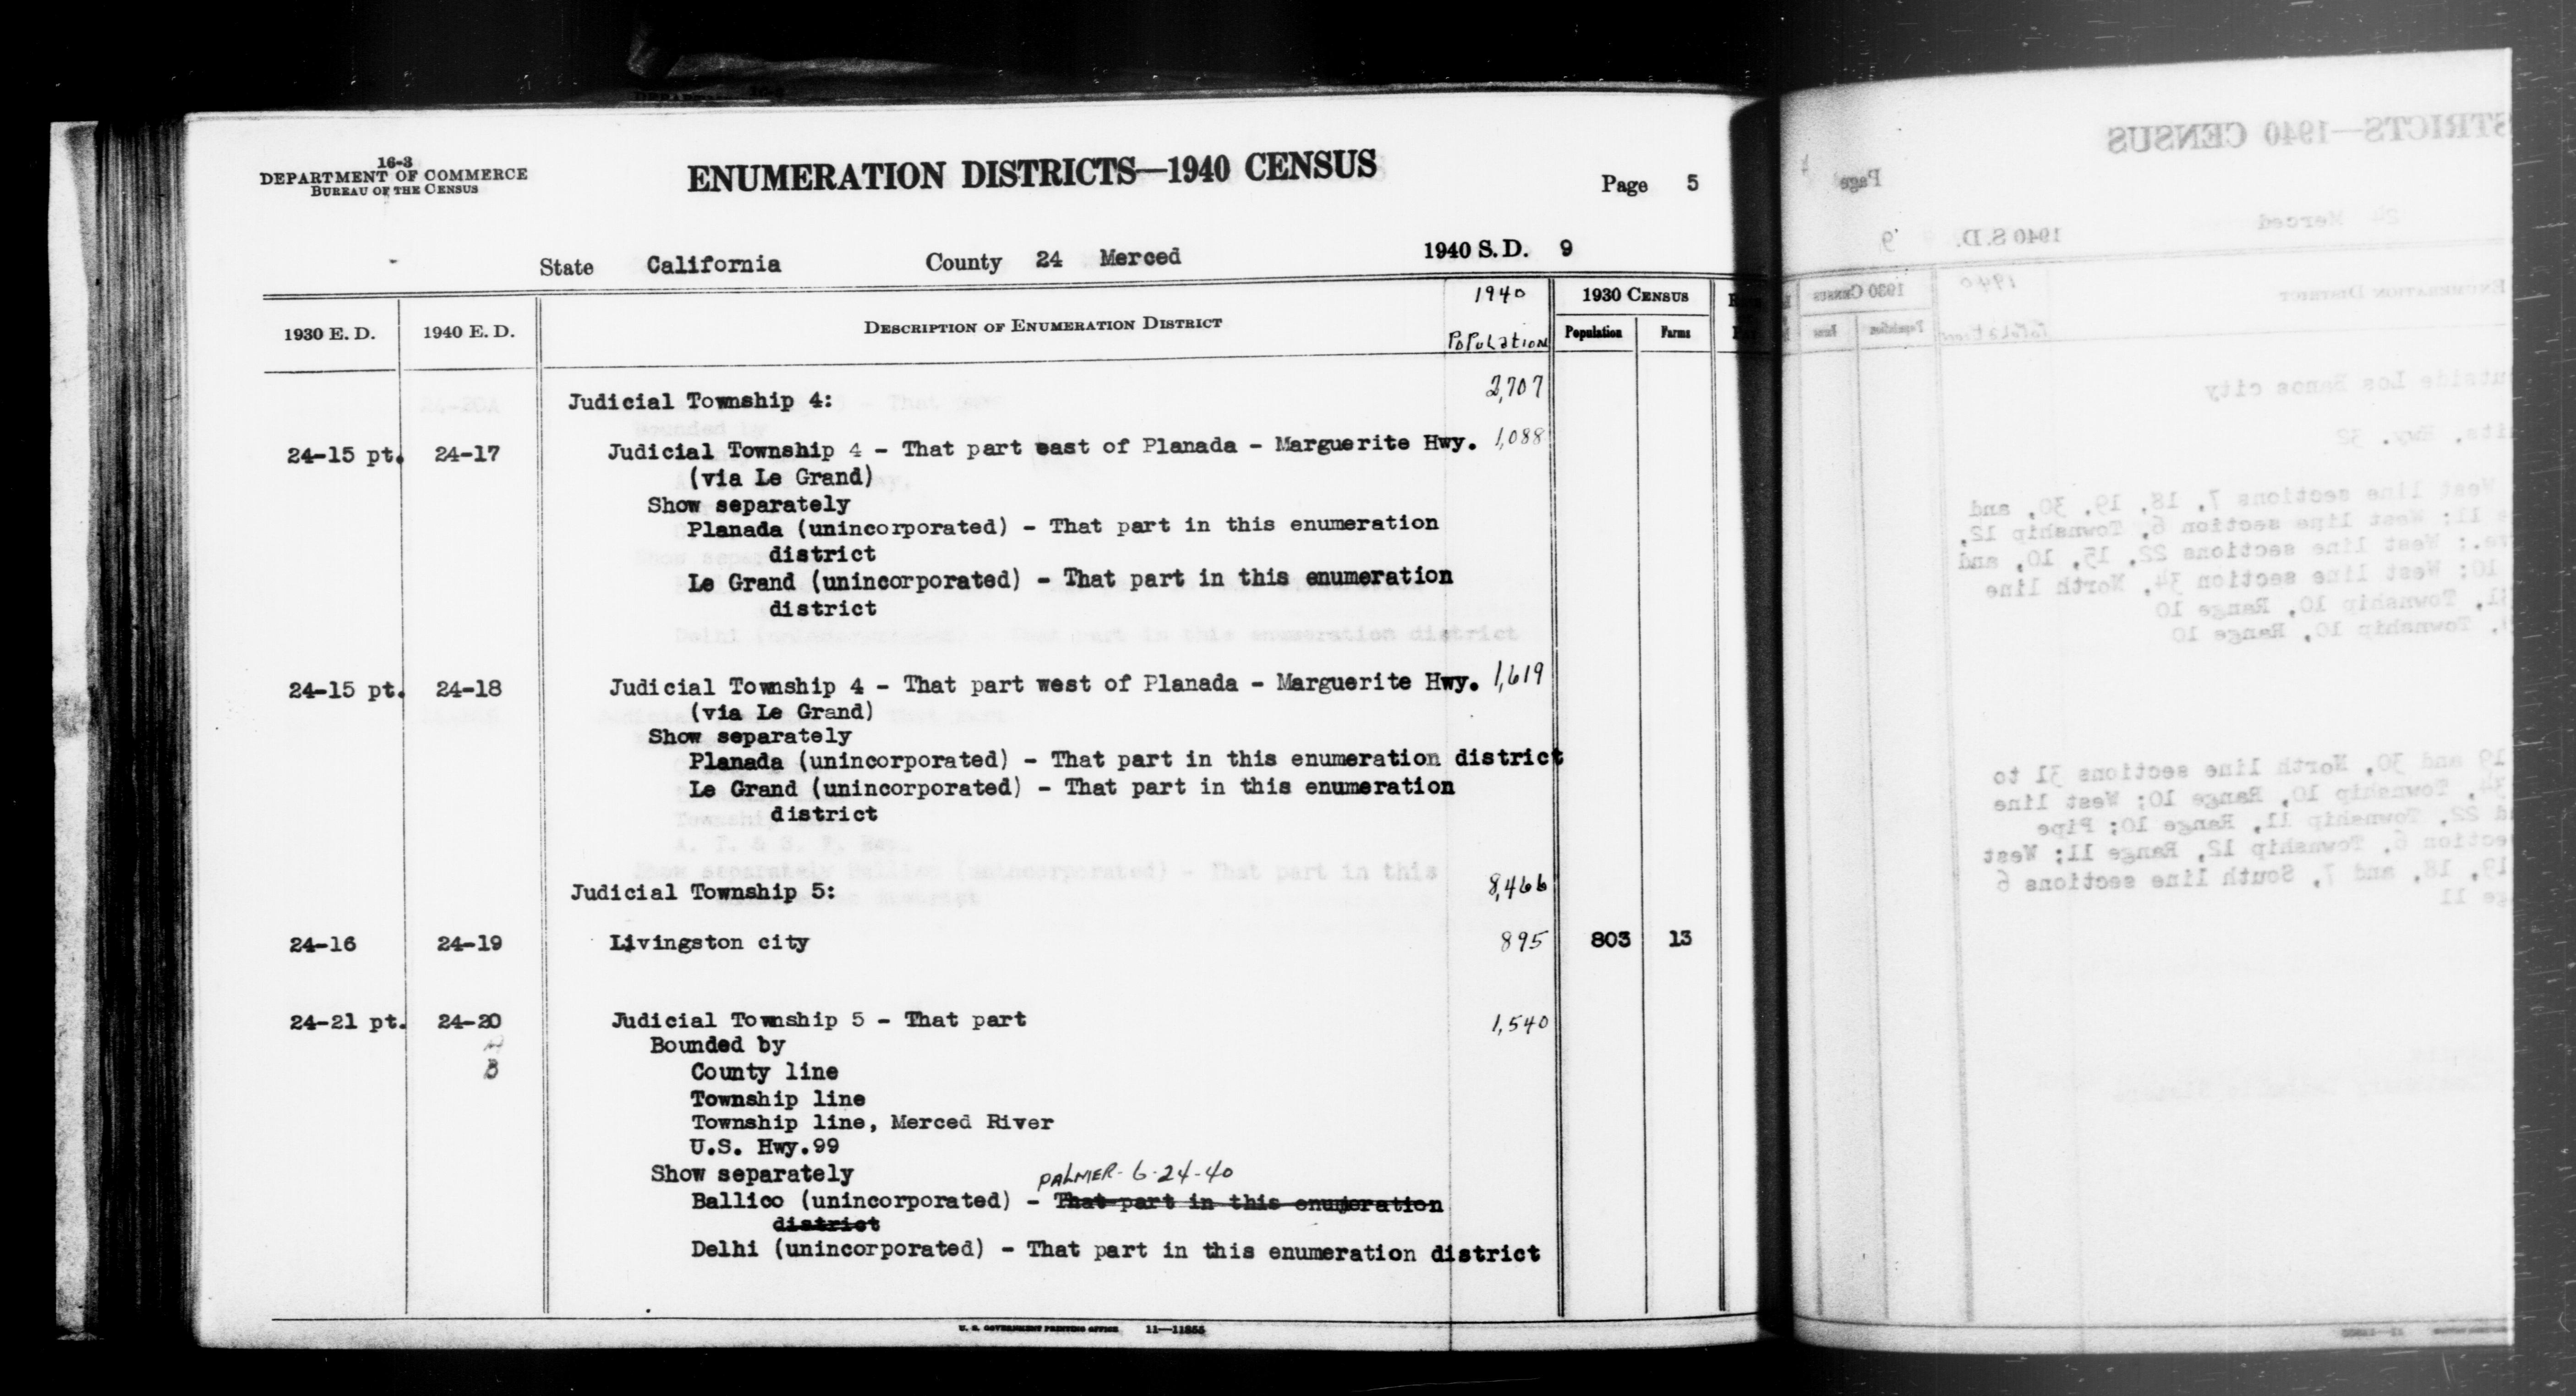 1940 Census Enumeration District Descriptions - California - Merced County - ED 24-17, ED 24-18, ED 24-19, ED 24-20A, ED 24-20B